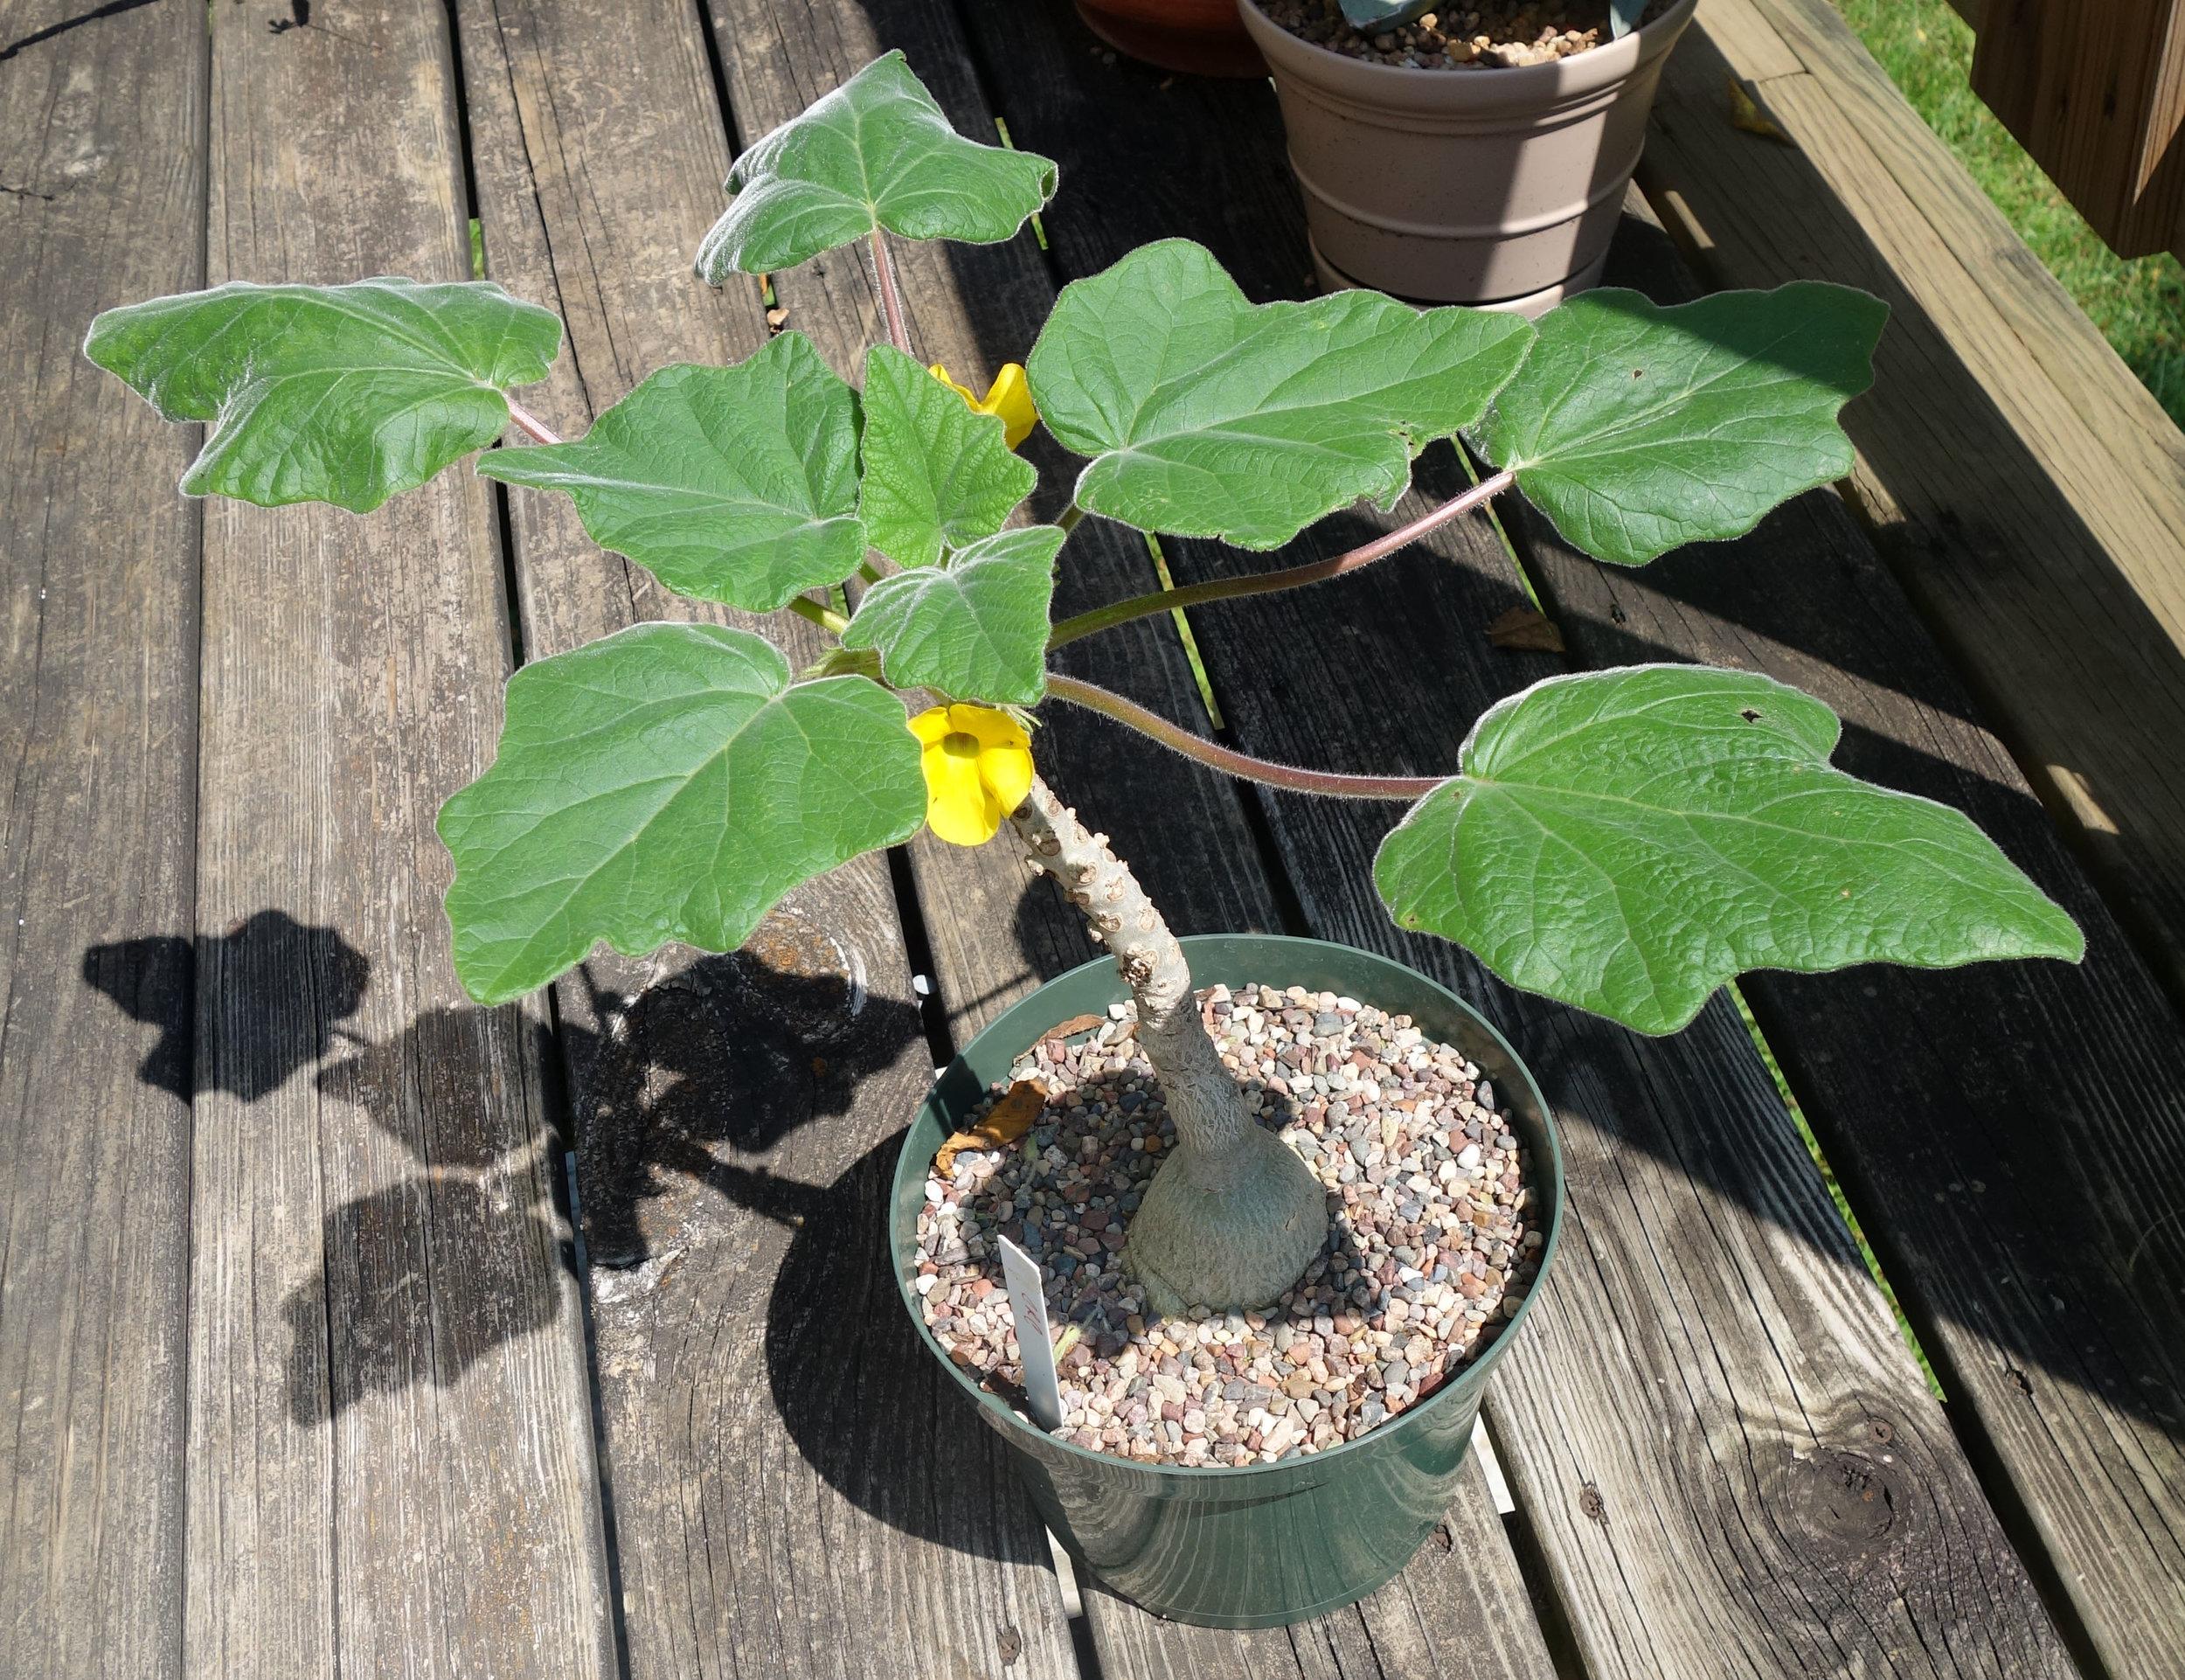 Uncarina roeoesliana flowering A16.jpg